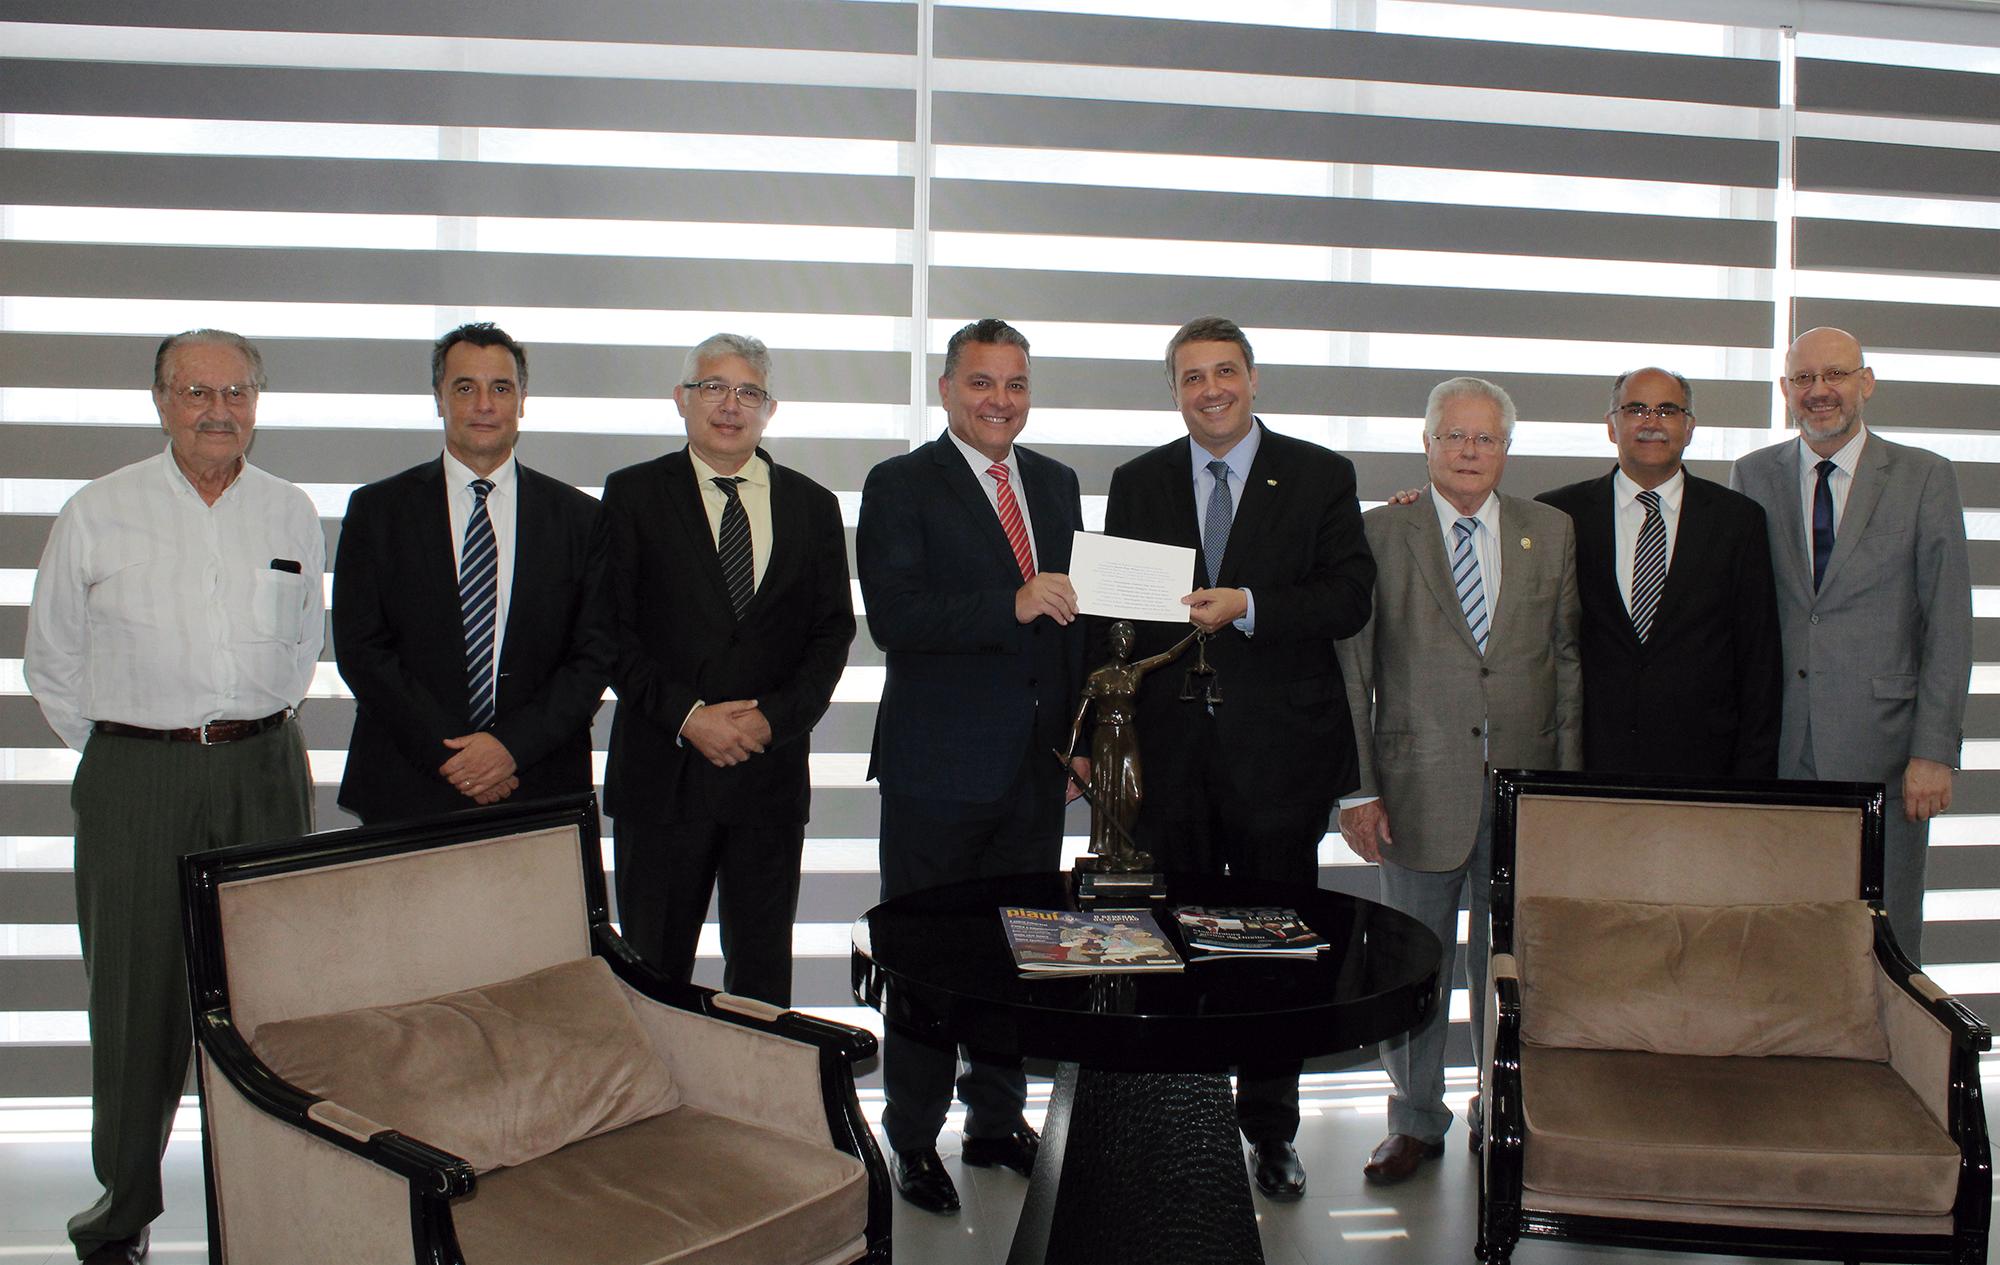 Presidente da AMAPAR recebe convite para posse da nova cúpula do TJPR